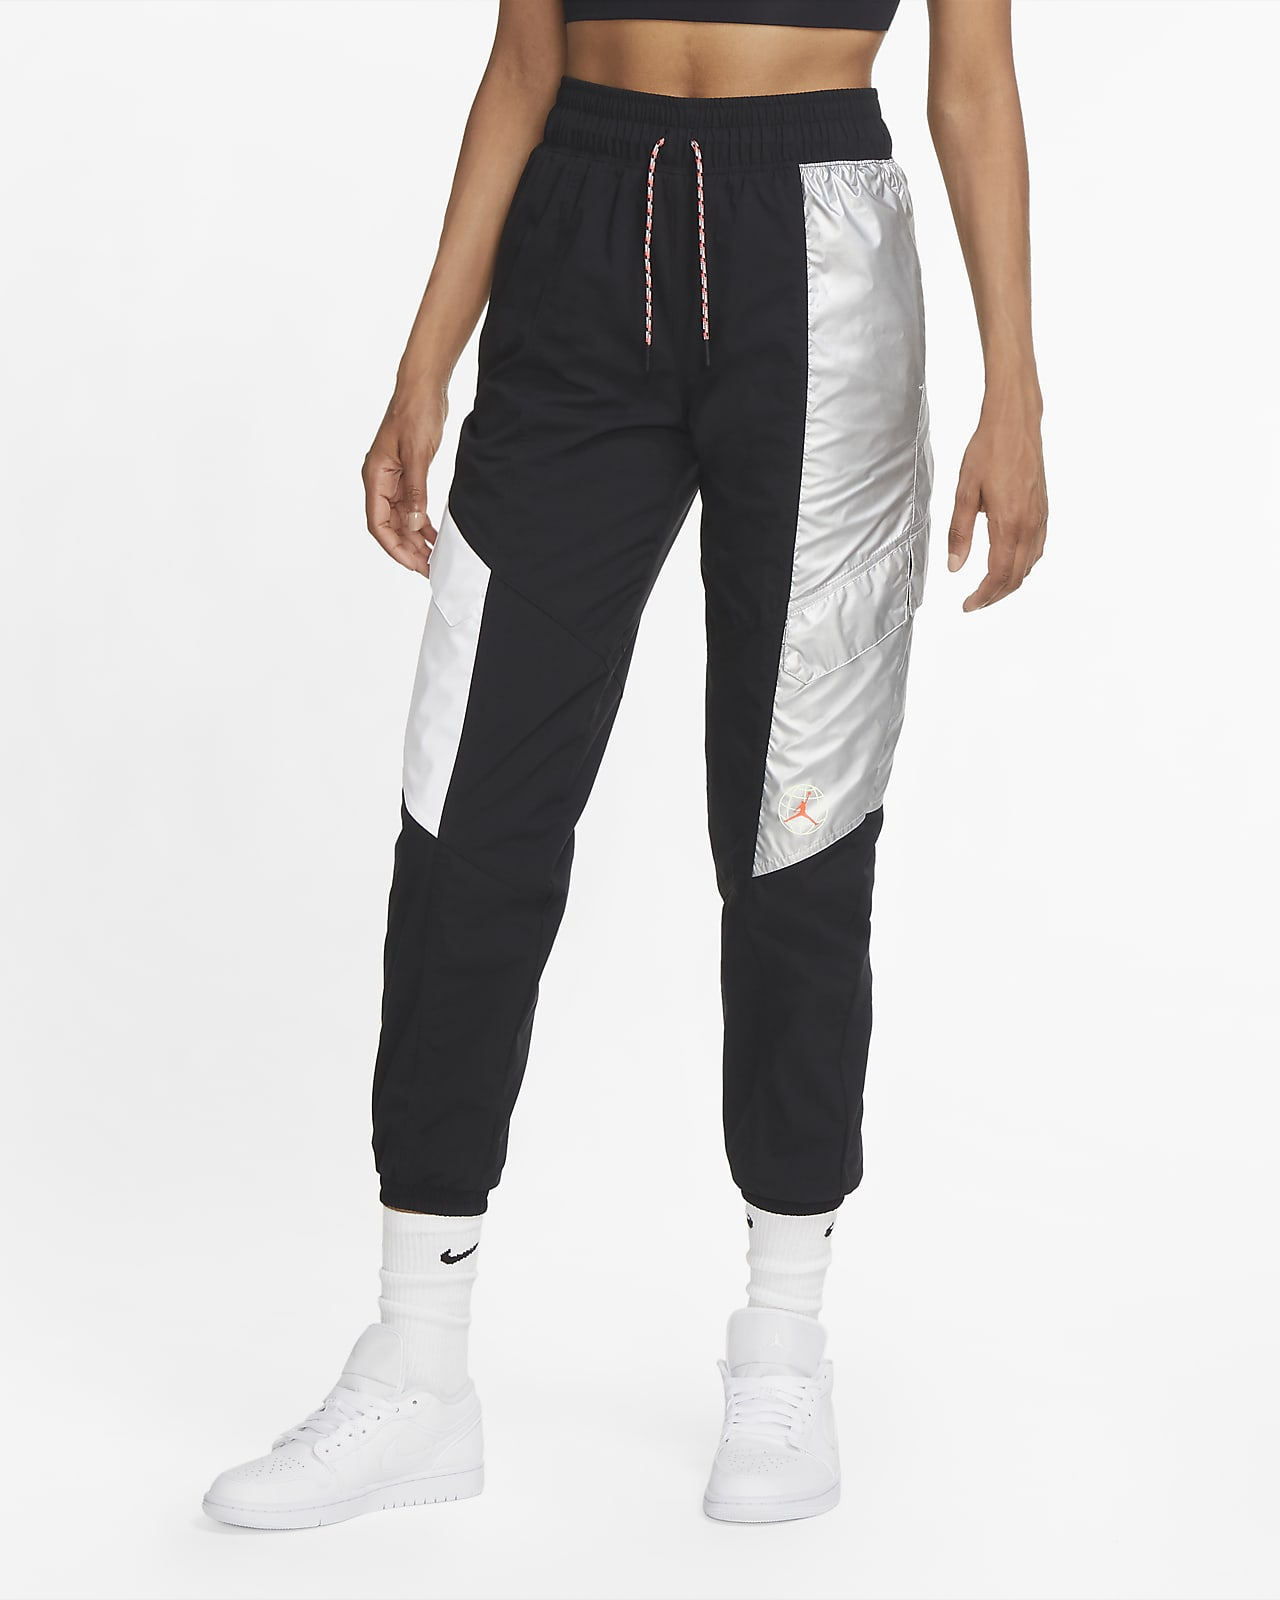 Pantalones para mujer Jordan Winter Utility